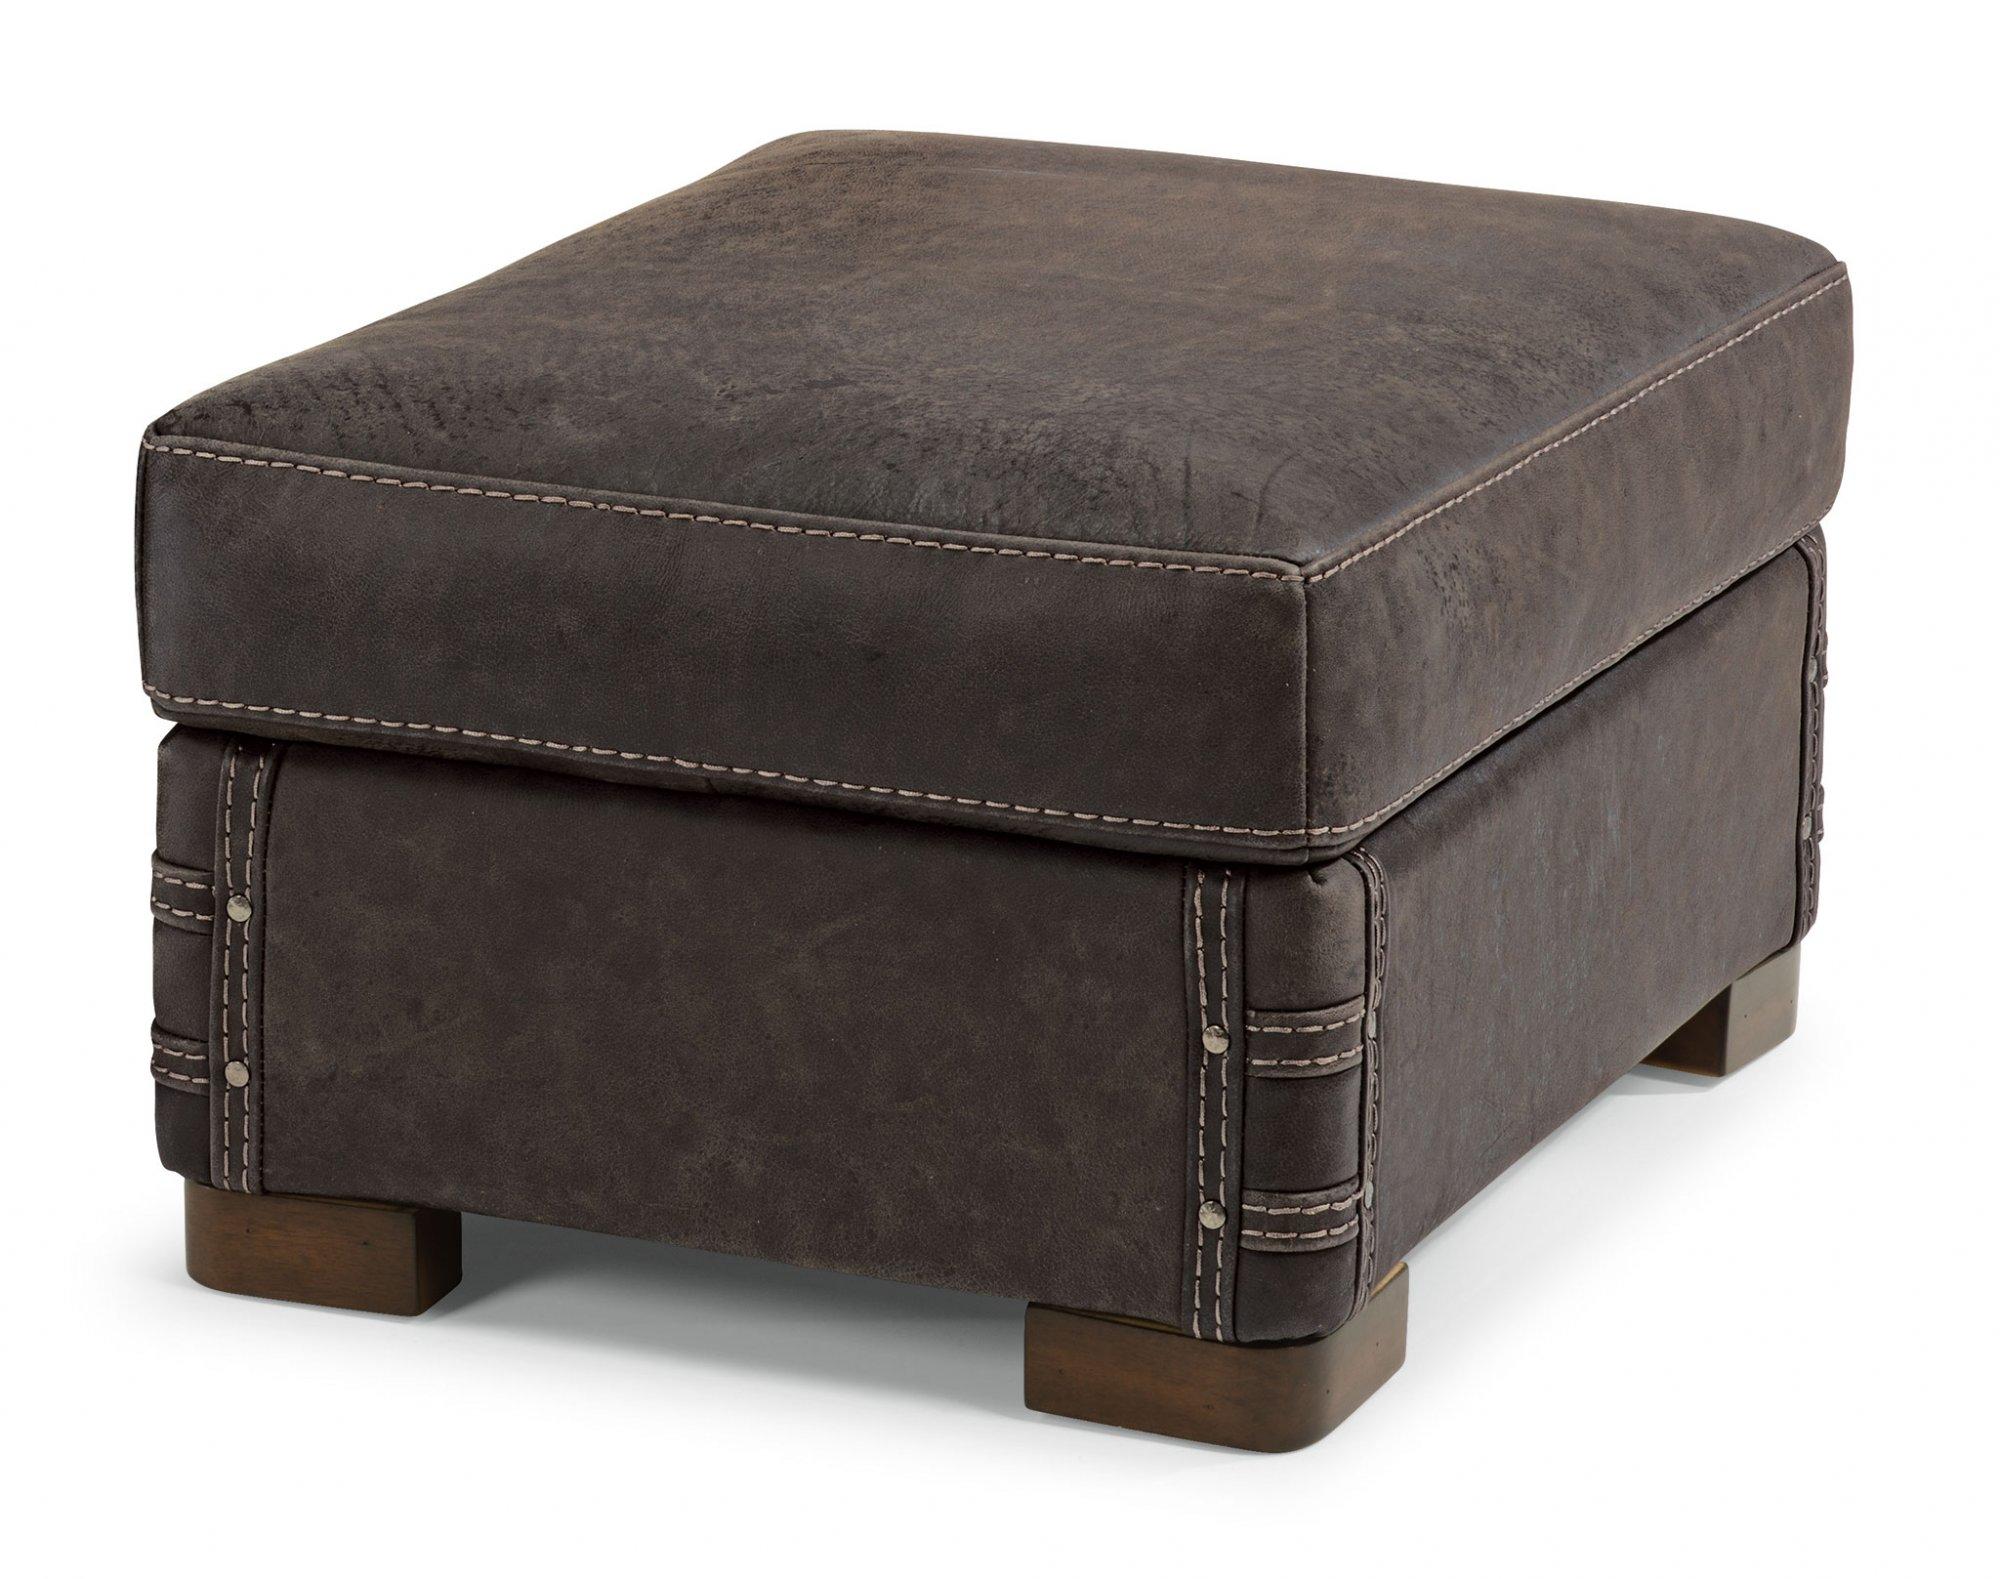 Stupendous Flexsteel 1131 08 Lomax Leather Ottoman Highway Unemploymentrelief Wooden Chair Designs For Living Room Unemploymentrelieforg